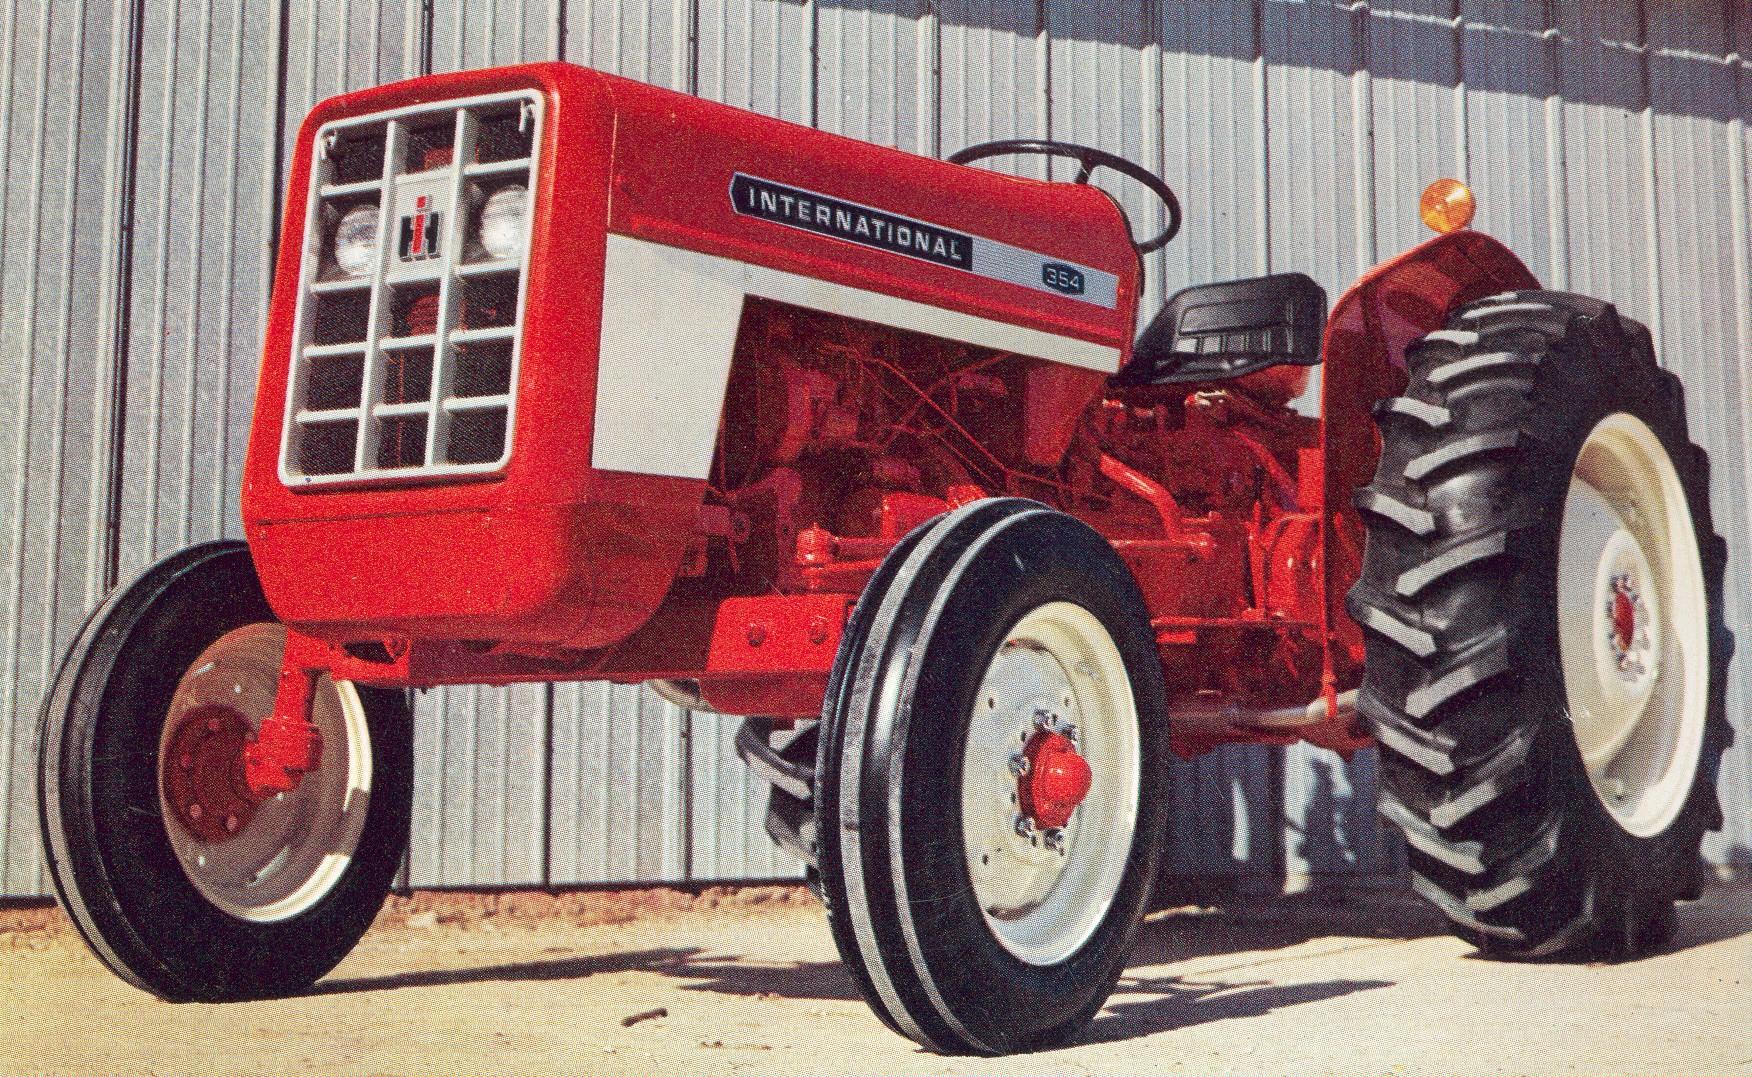 1976 International 666 Wiring Diagram Free Download 1956 Pickup Tractor Automotive Block